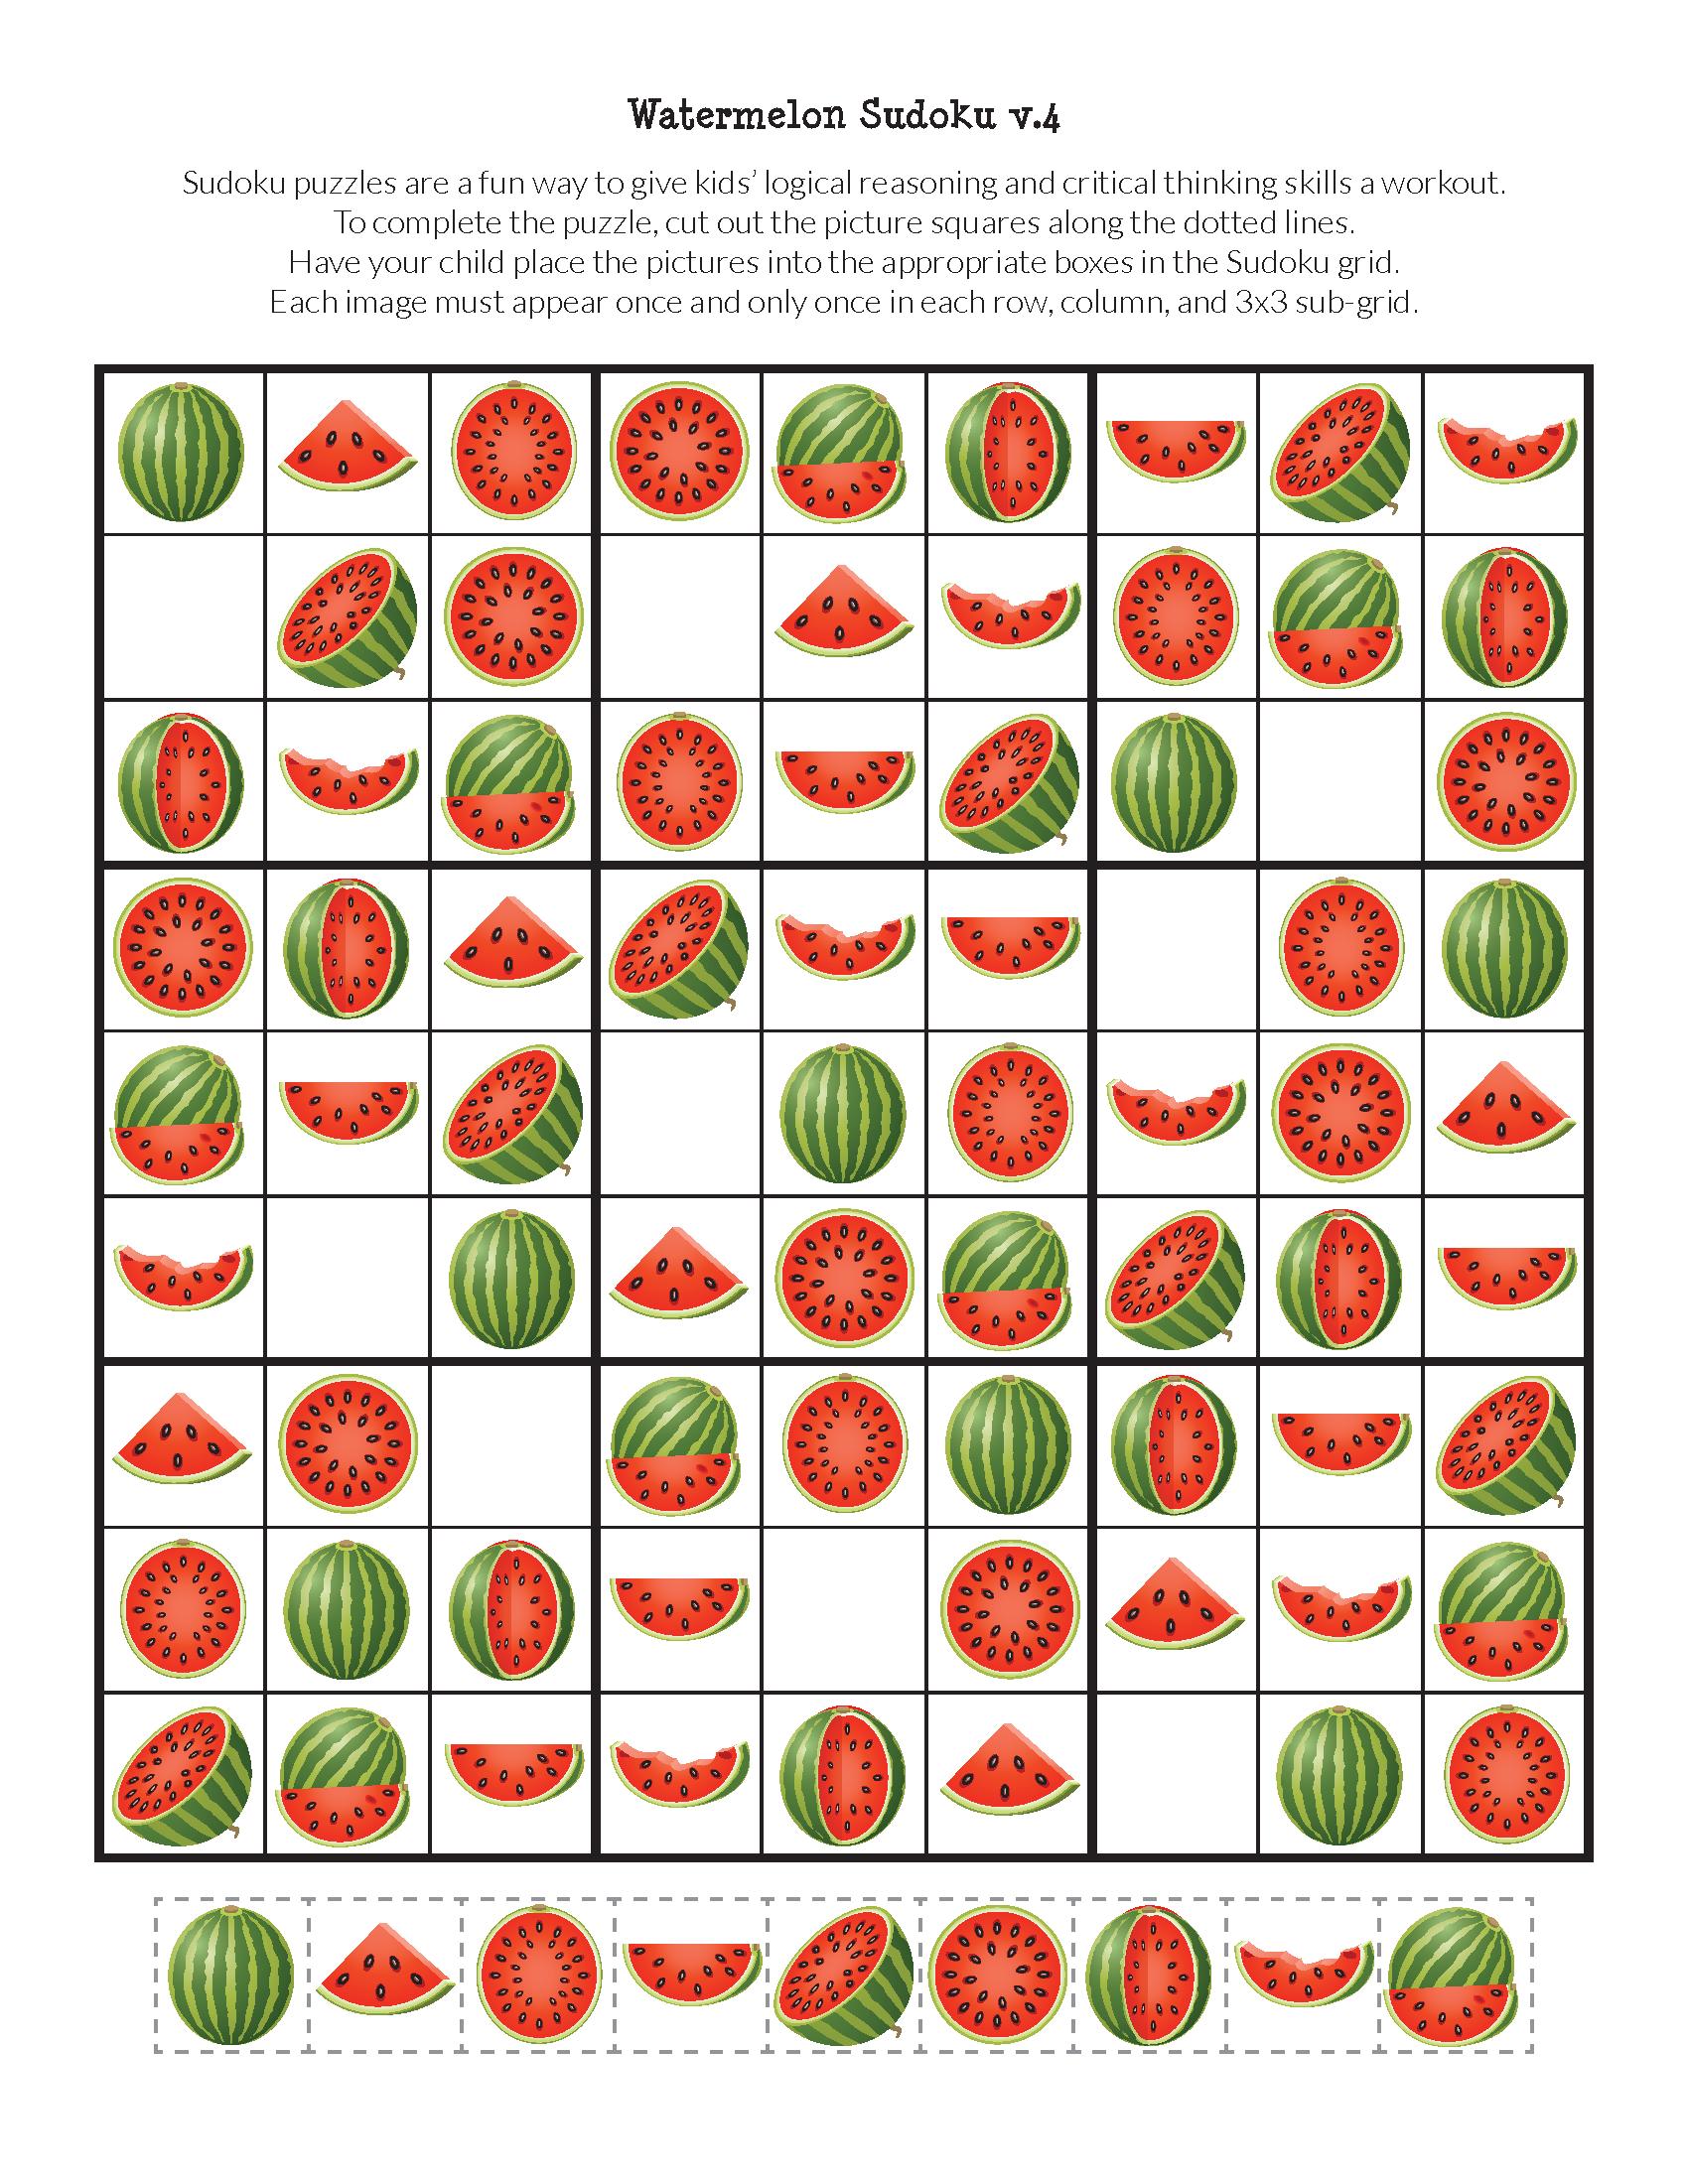 Watermelon Sudoku Puzzles Free Printables Free Puzzles For Kids Sudoku Puzzles Sudoku [ 2200 x 1700 Pixel ]